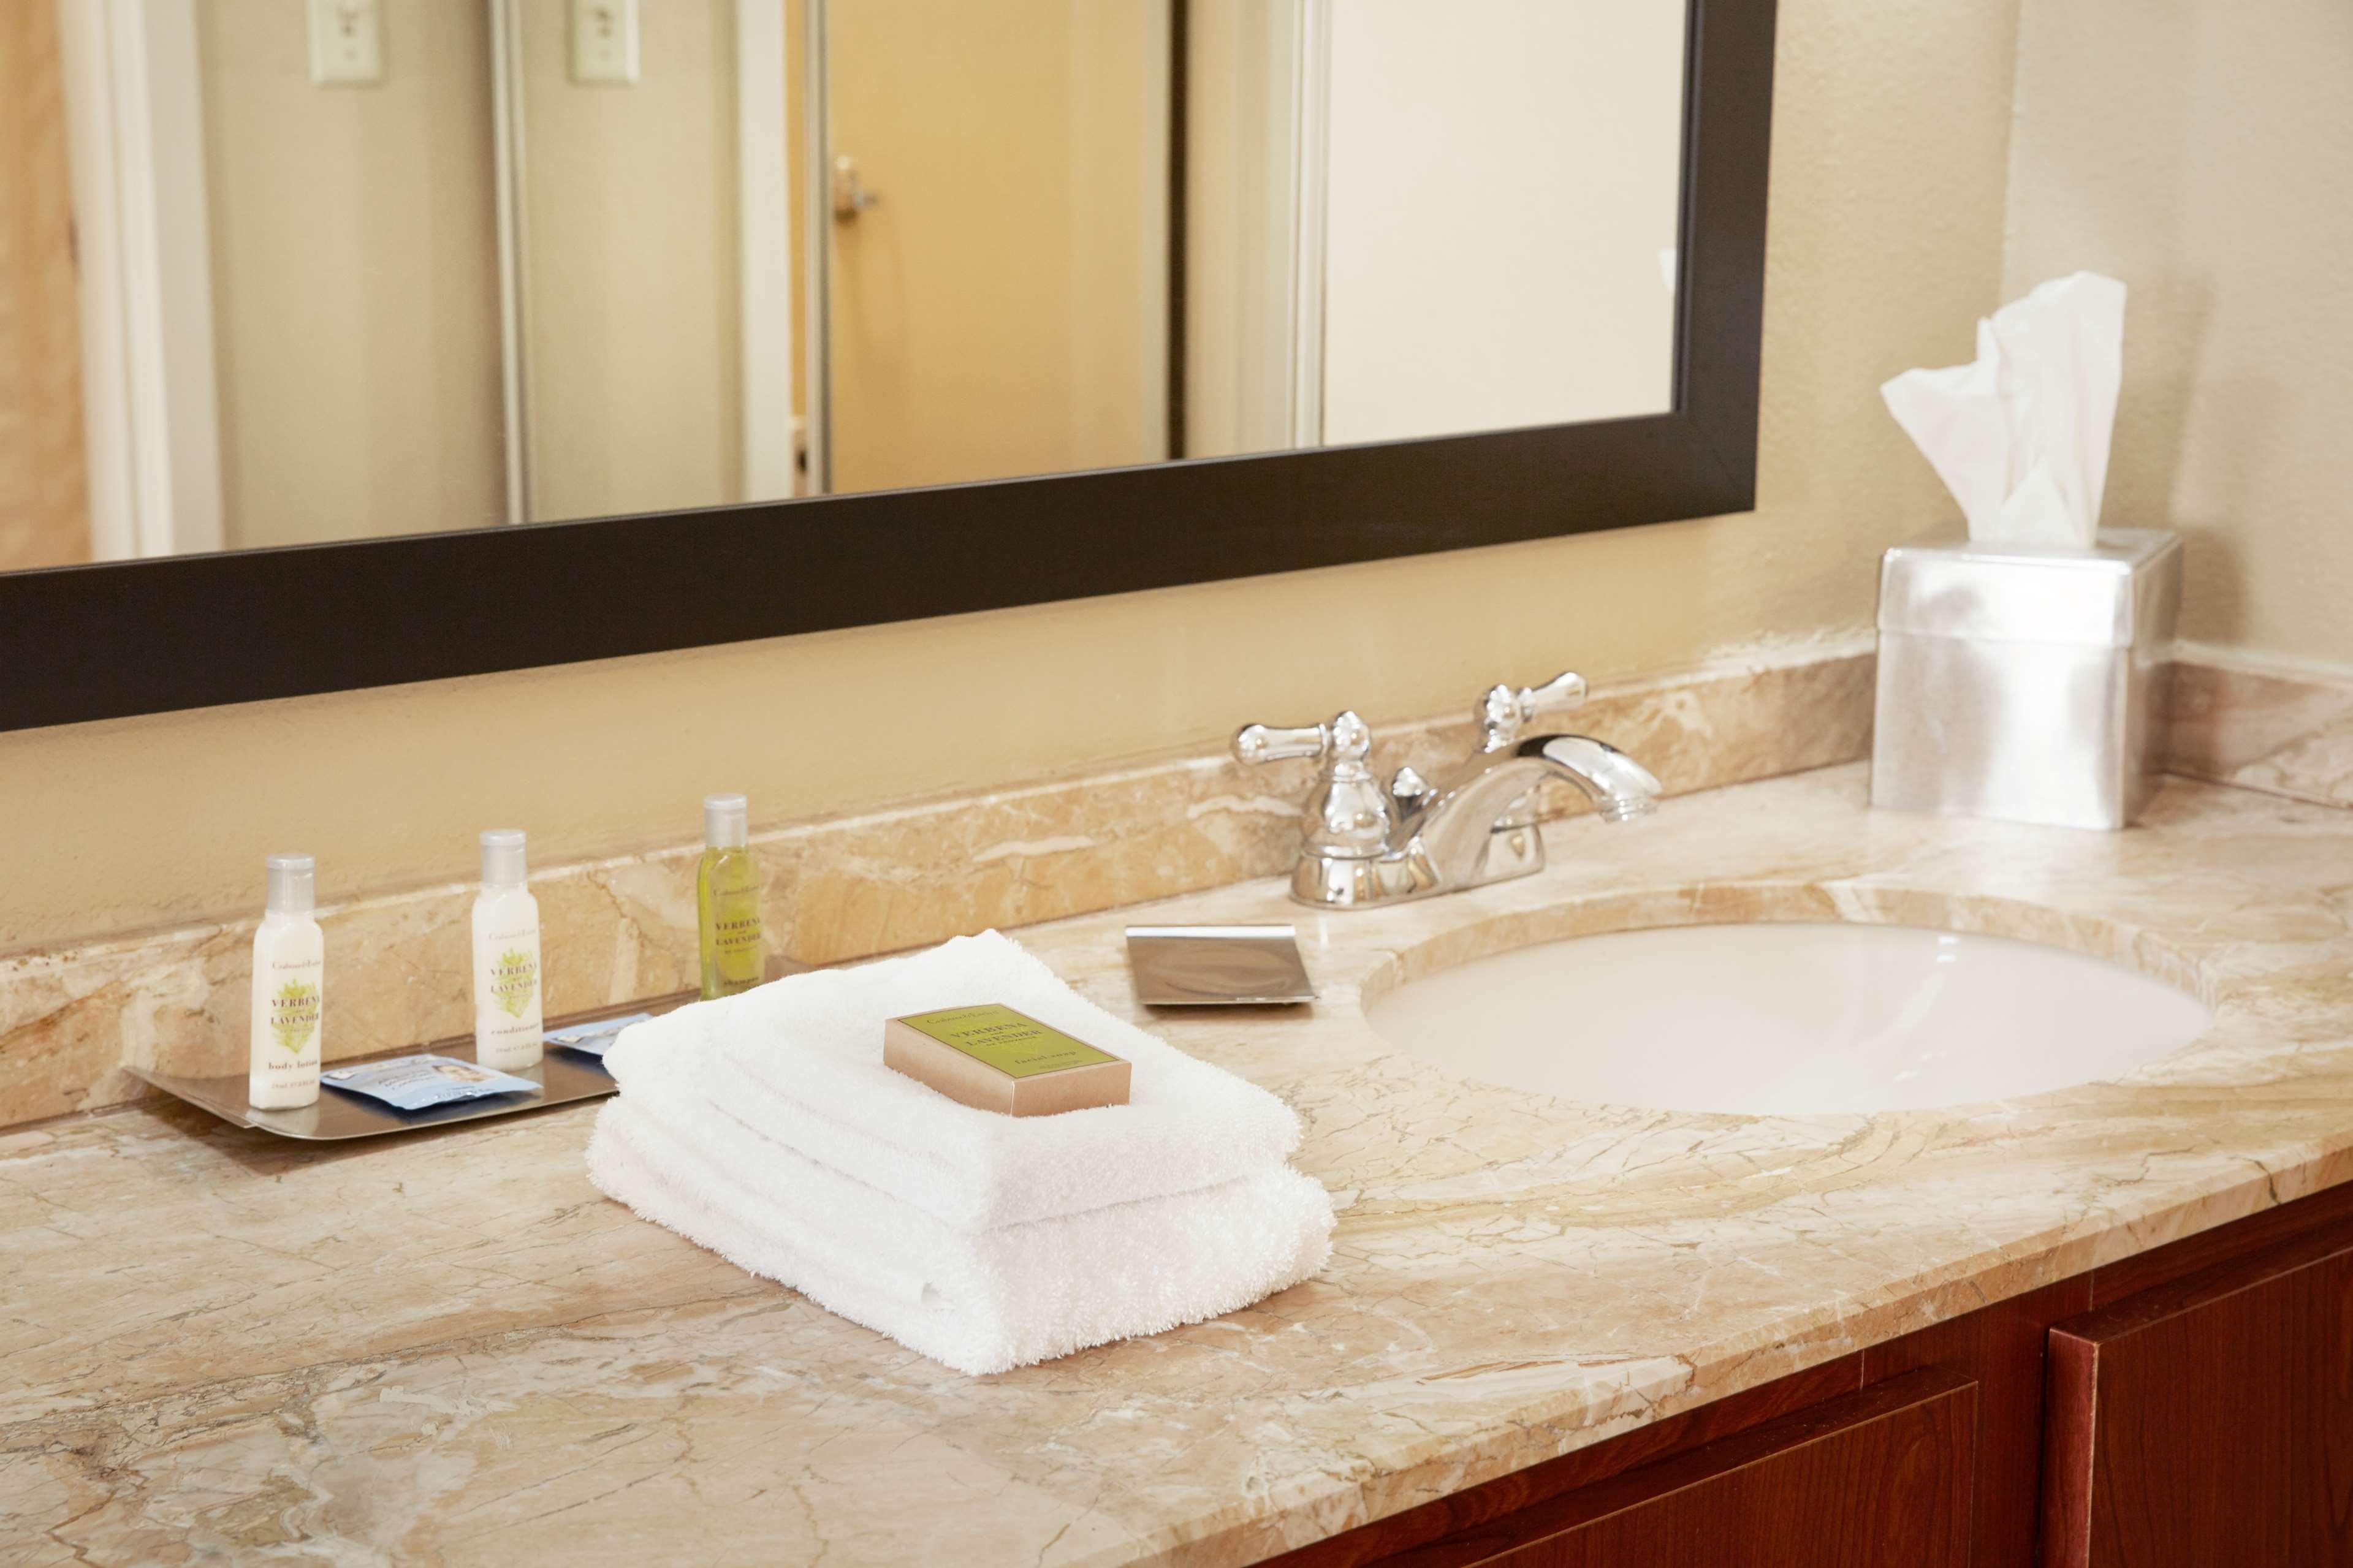 DoubleTree Suites by Hilton Hotel Cincinnati - Blue Ash image 18